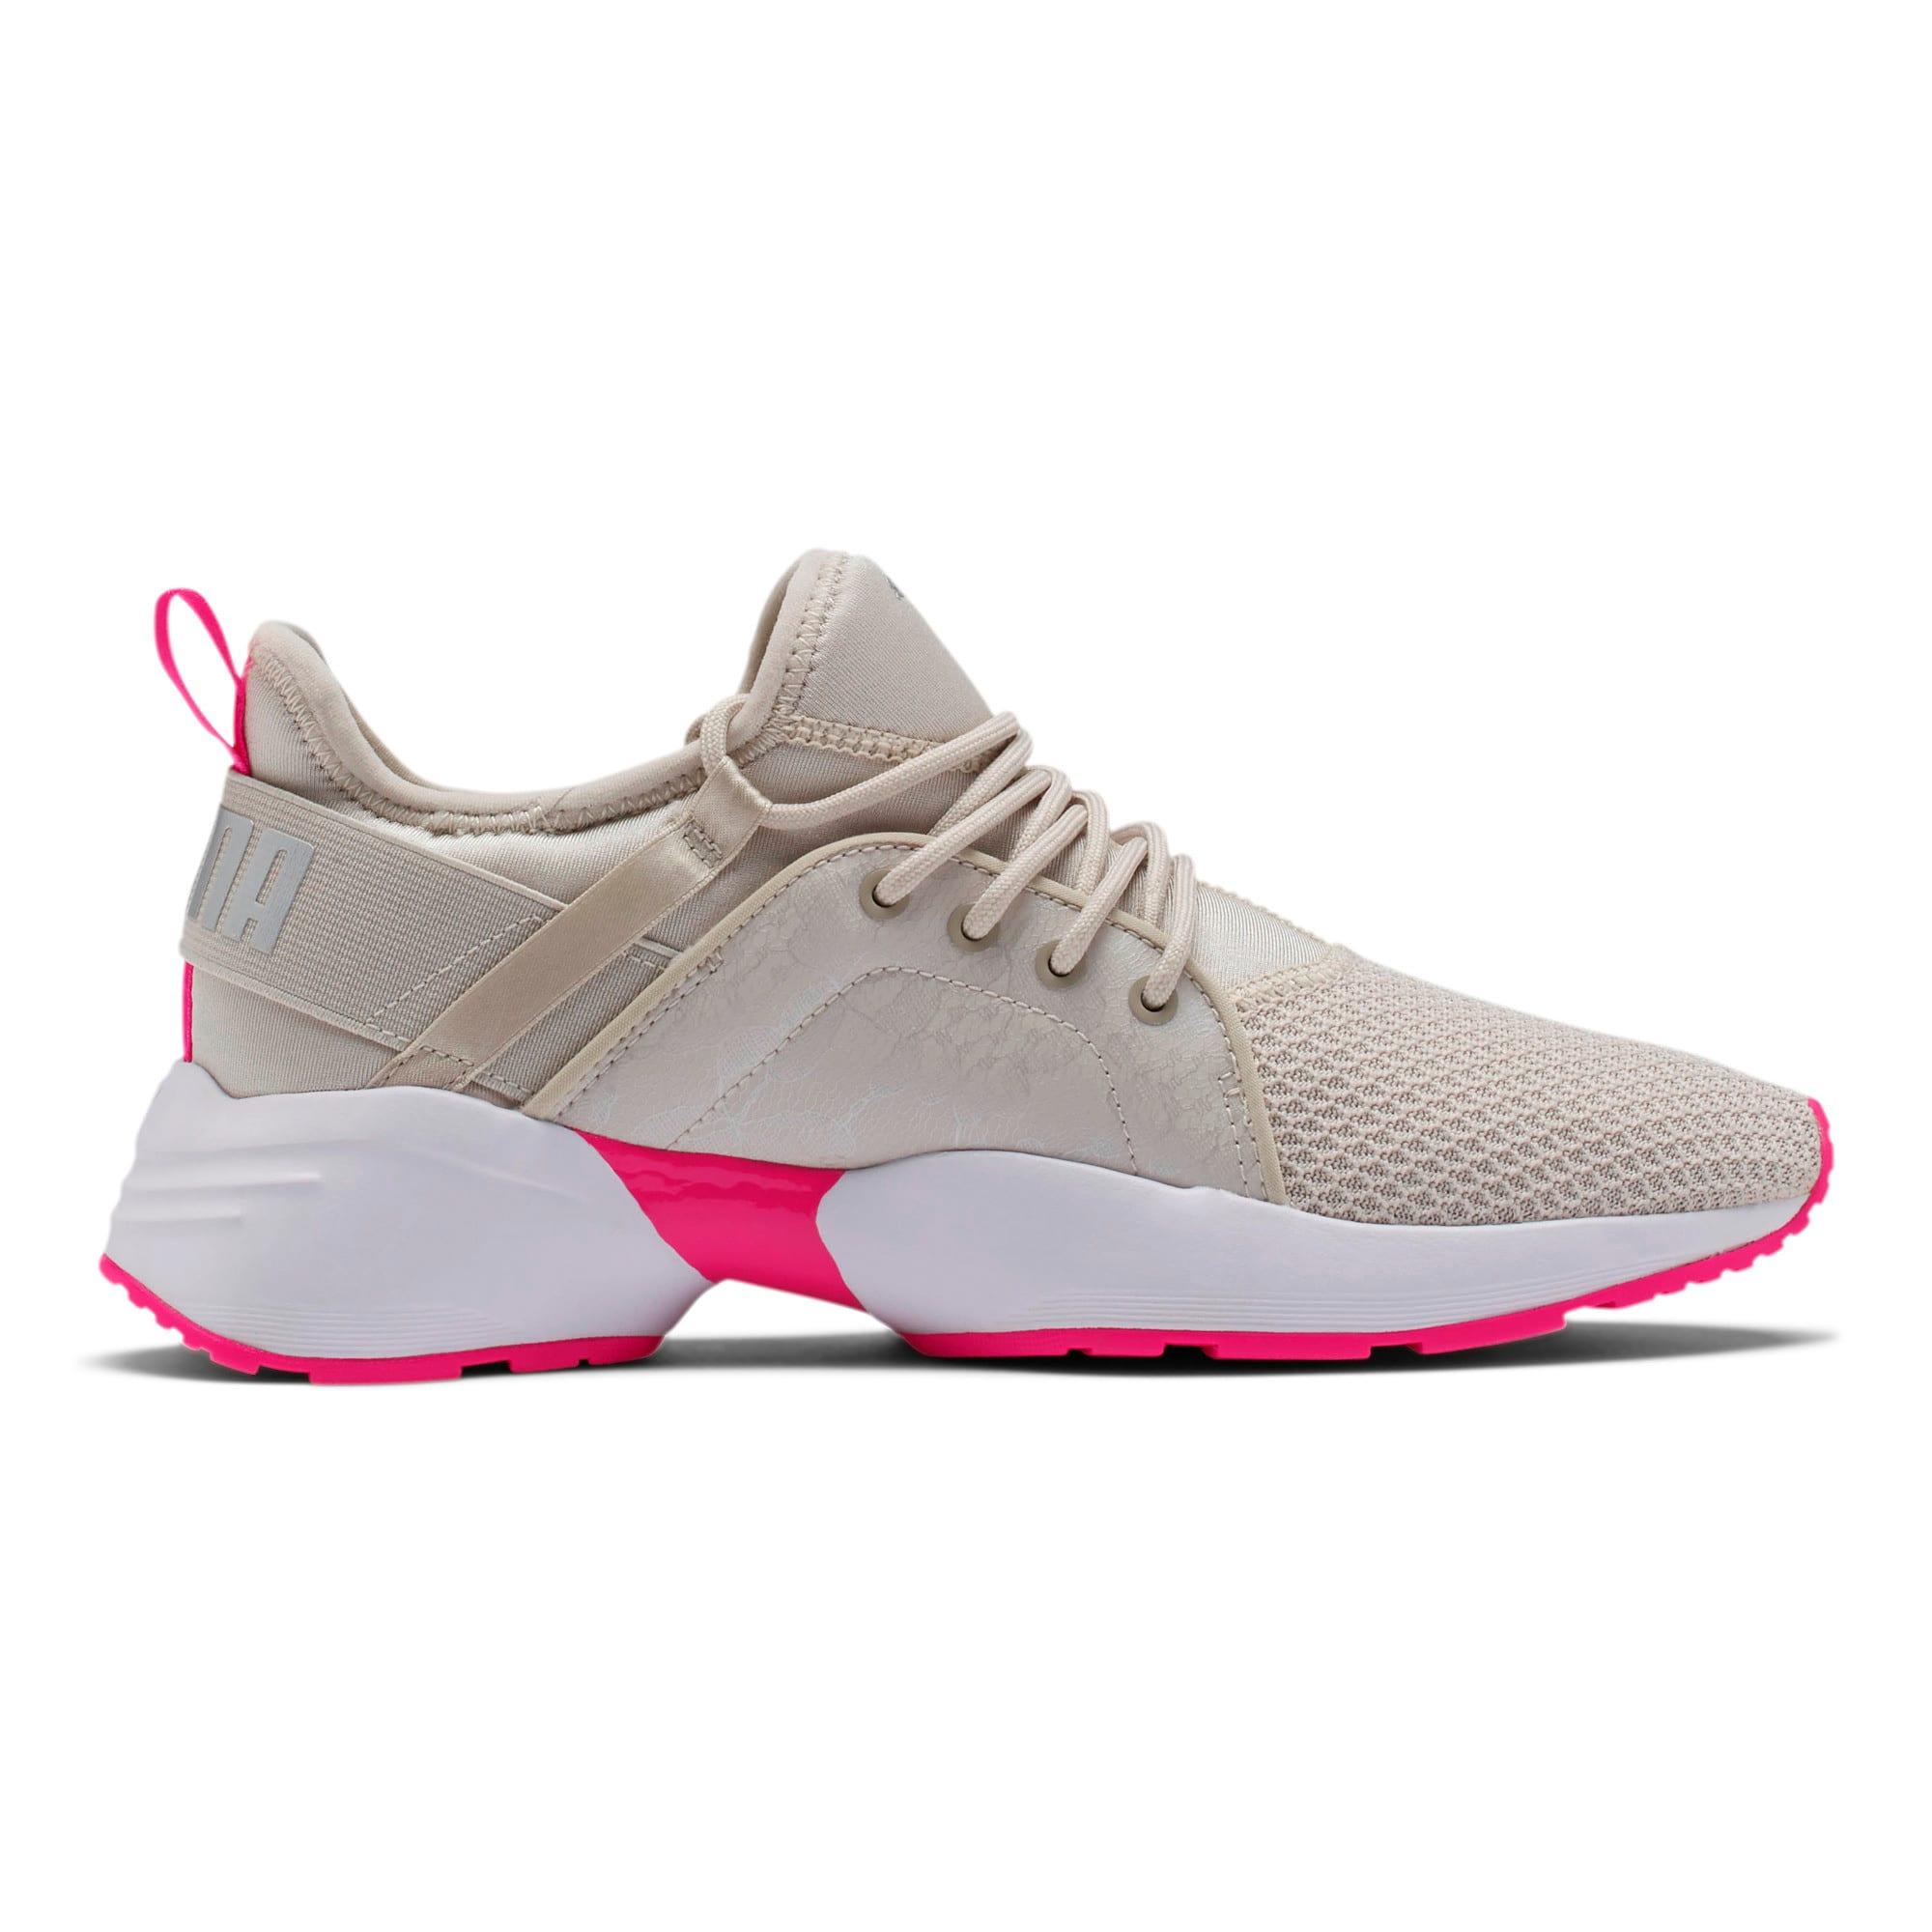 Thumbnail 5 of Sirena Summer Women's Sneakers, Silver Gray-Puma White, medium